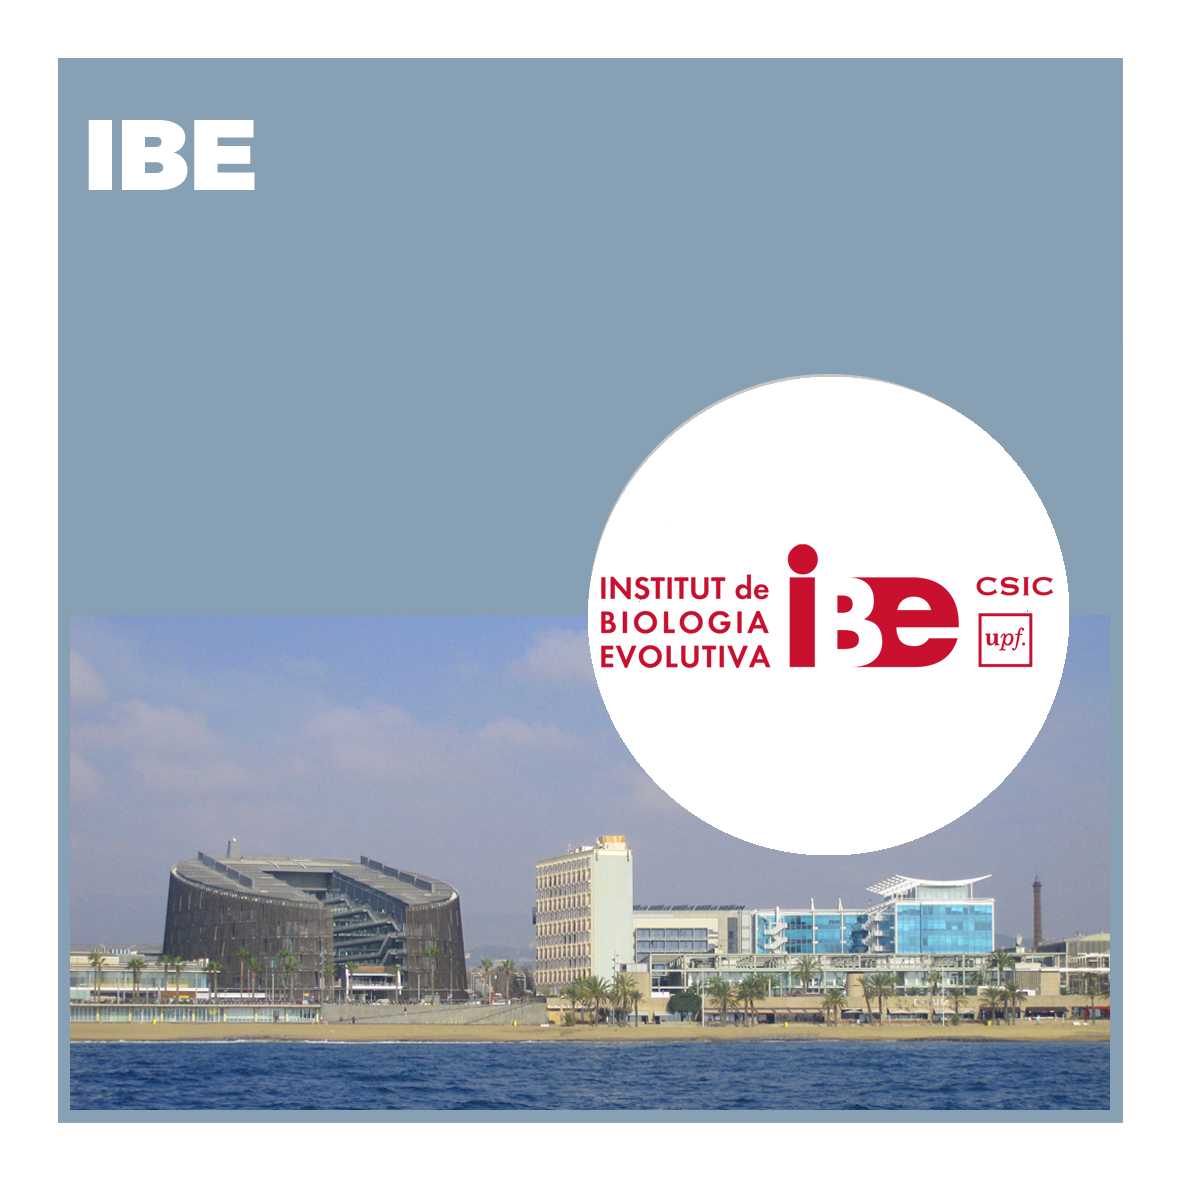 Instituto de Biología Evolutiva (IBE)